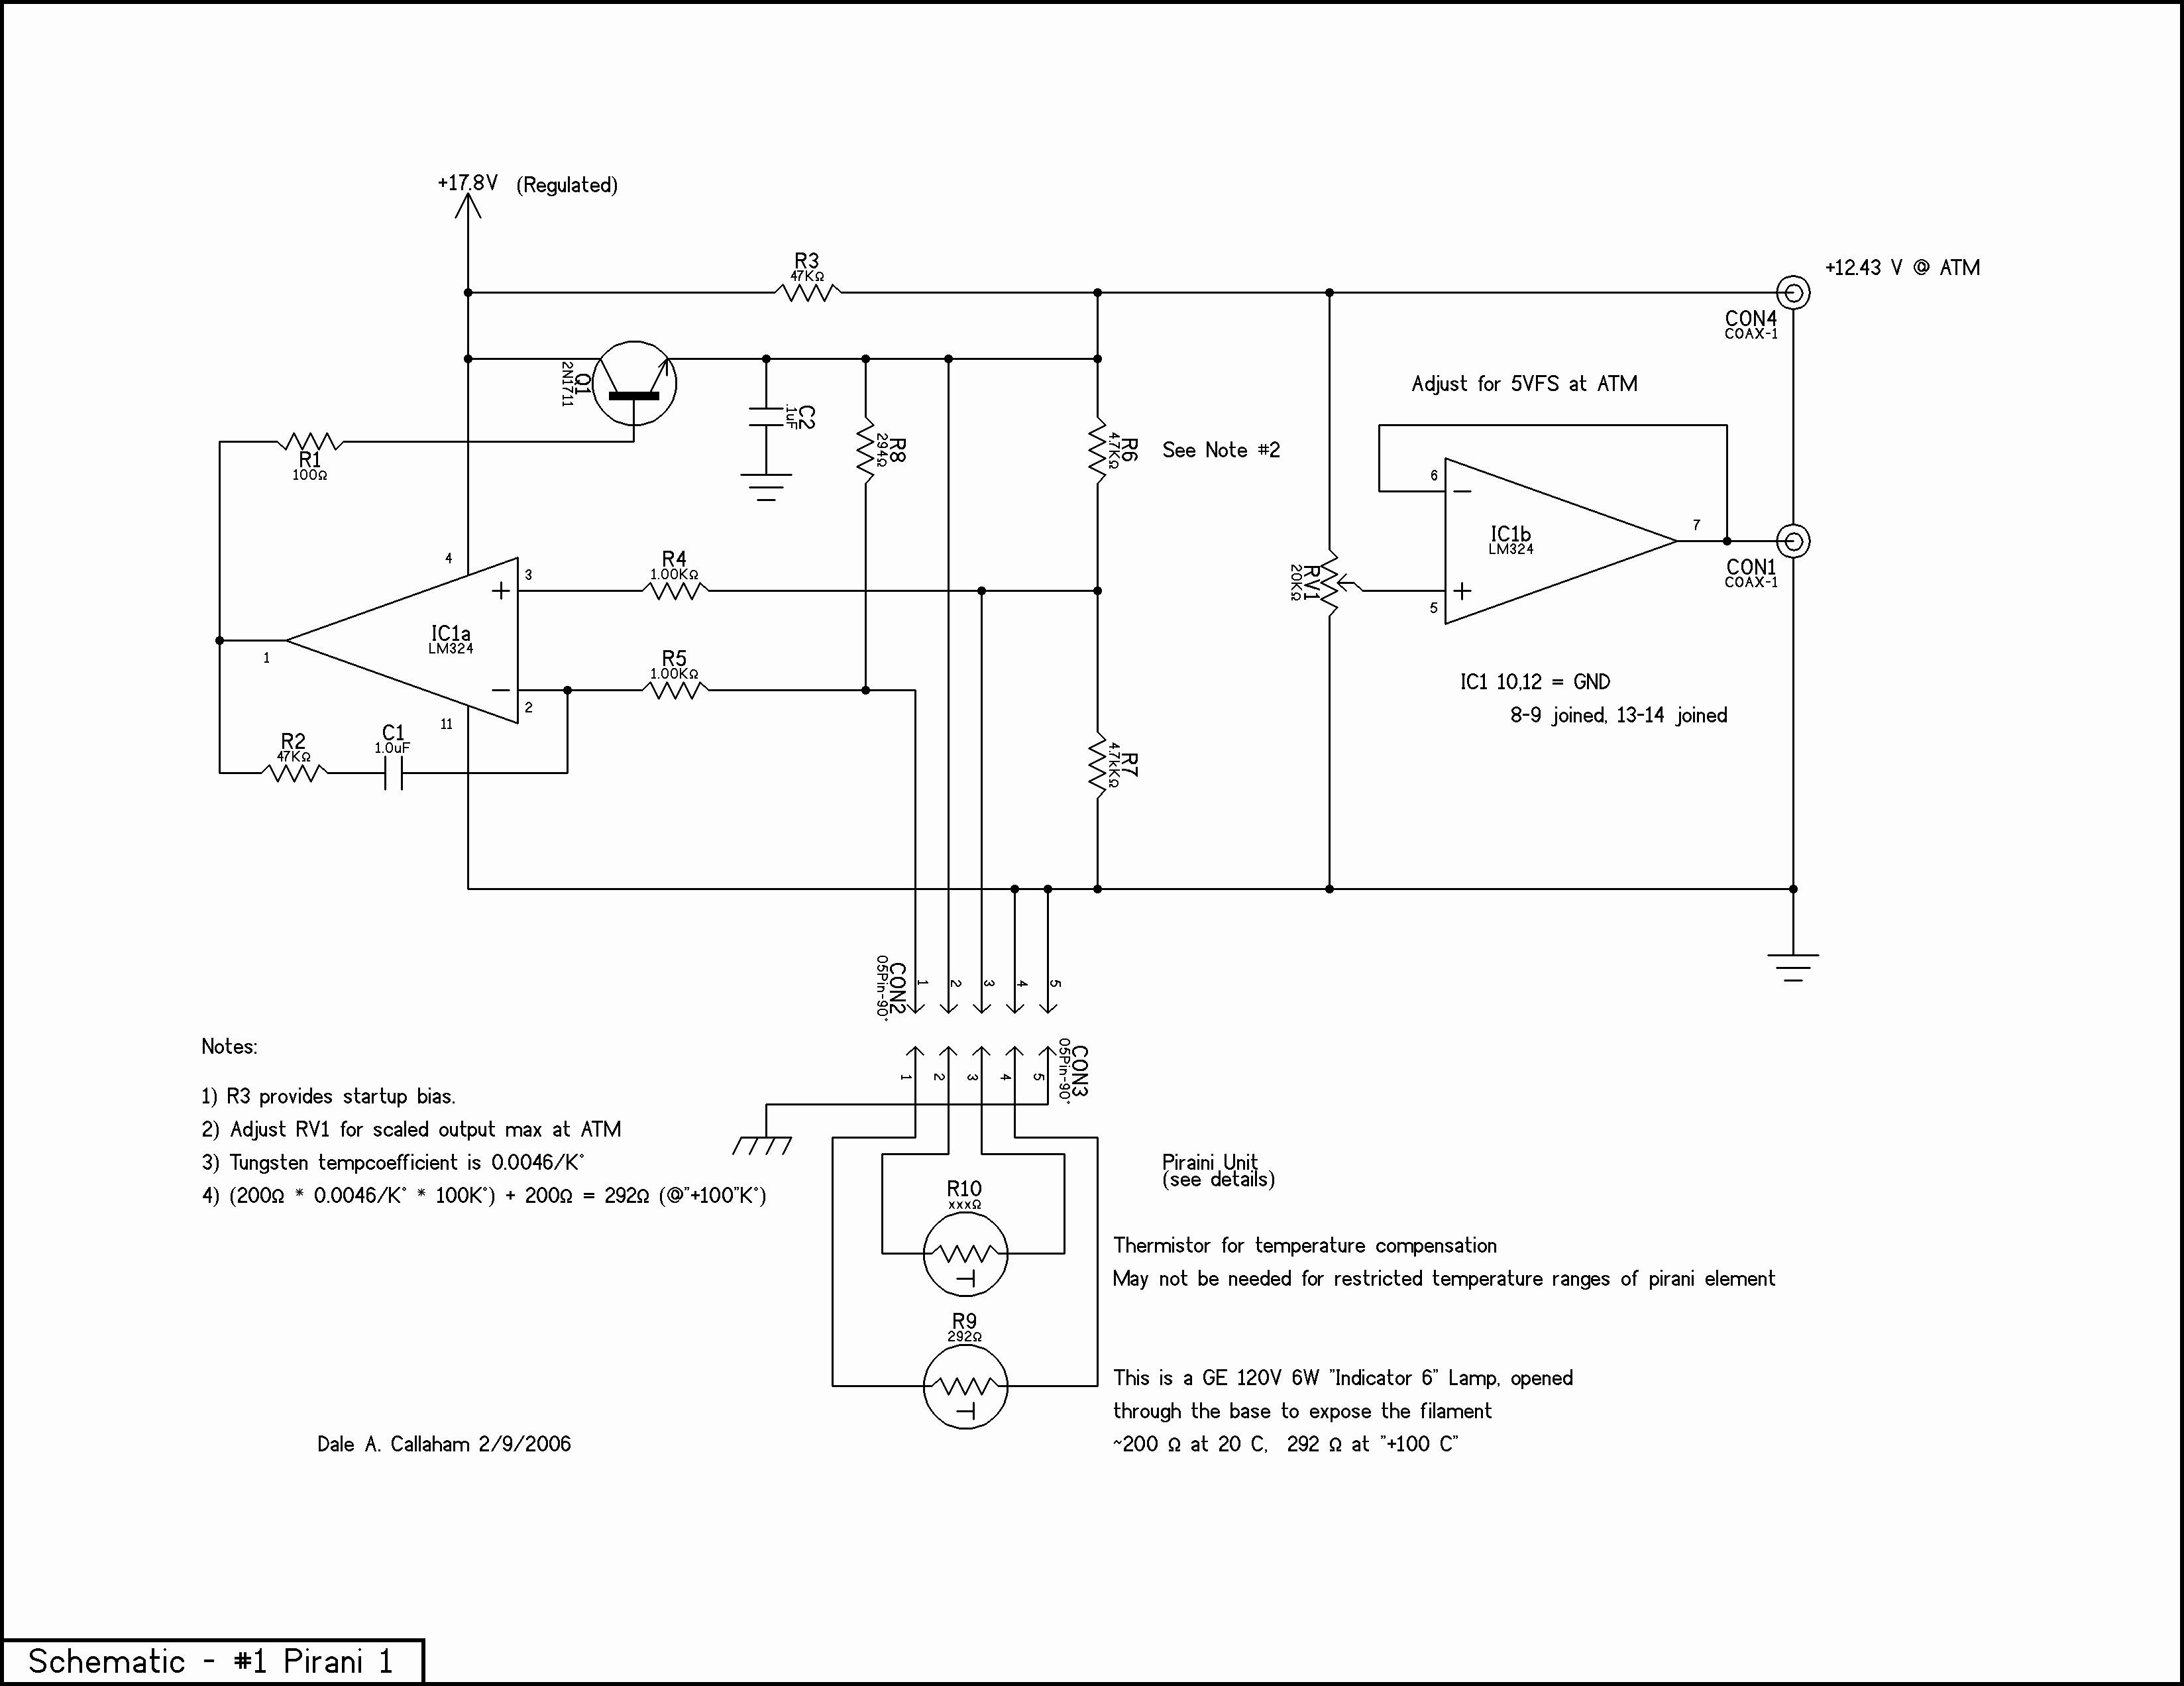 Light Wiring Diagram Electrical Floor Plan Unique Unique Light Wiring Diagram Diagram Of Light Wiring Diagram